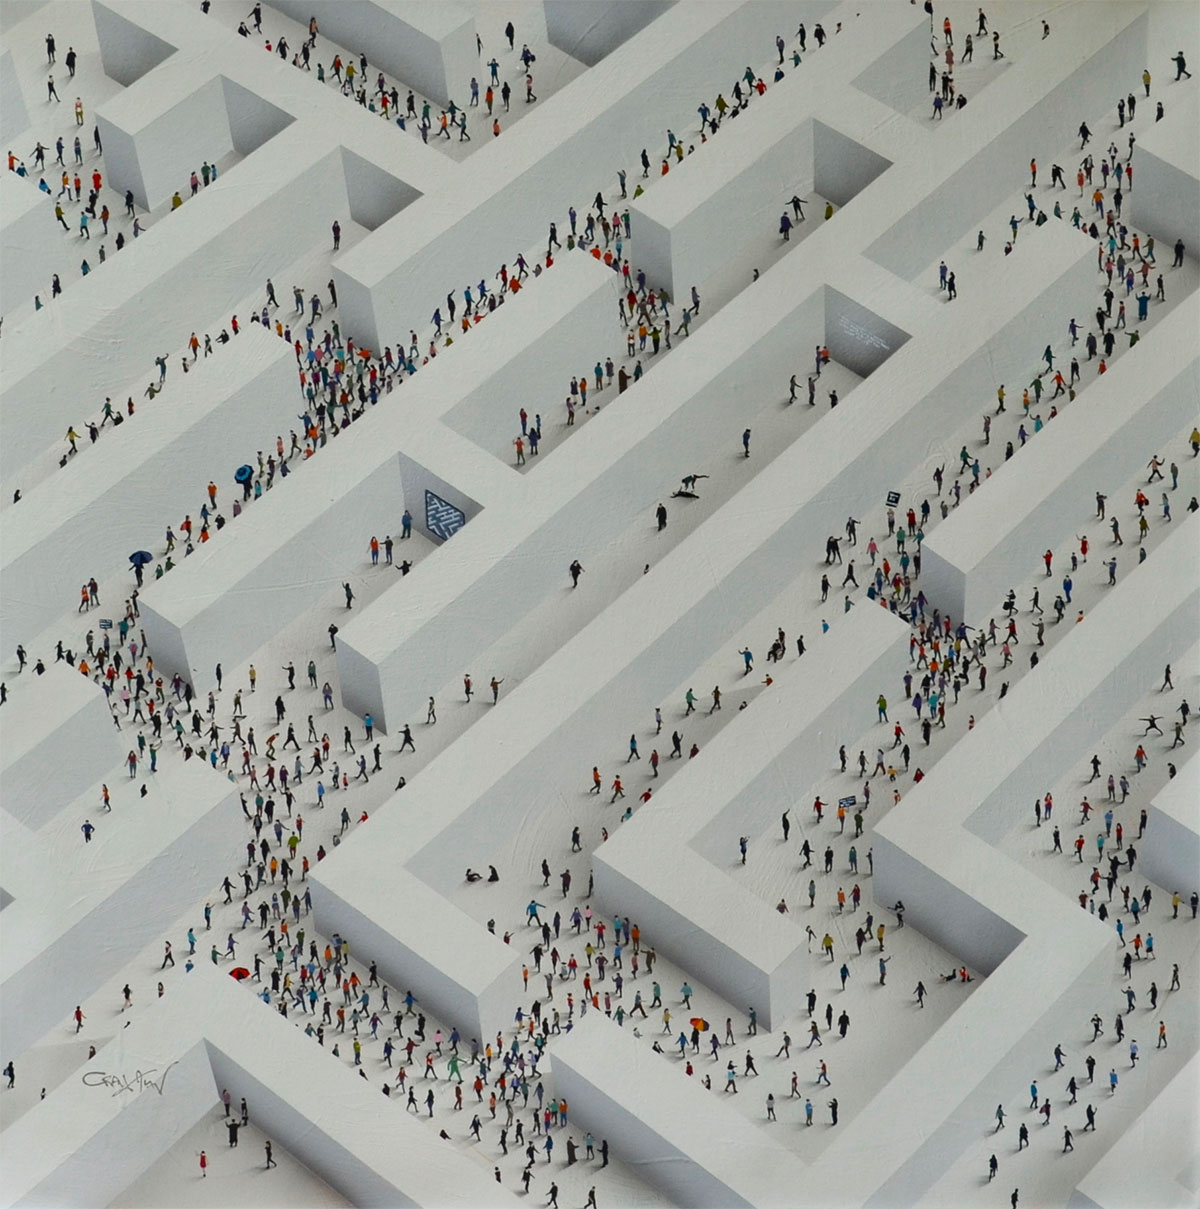 craig alan painting of tiny people walking around an endless maze